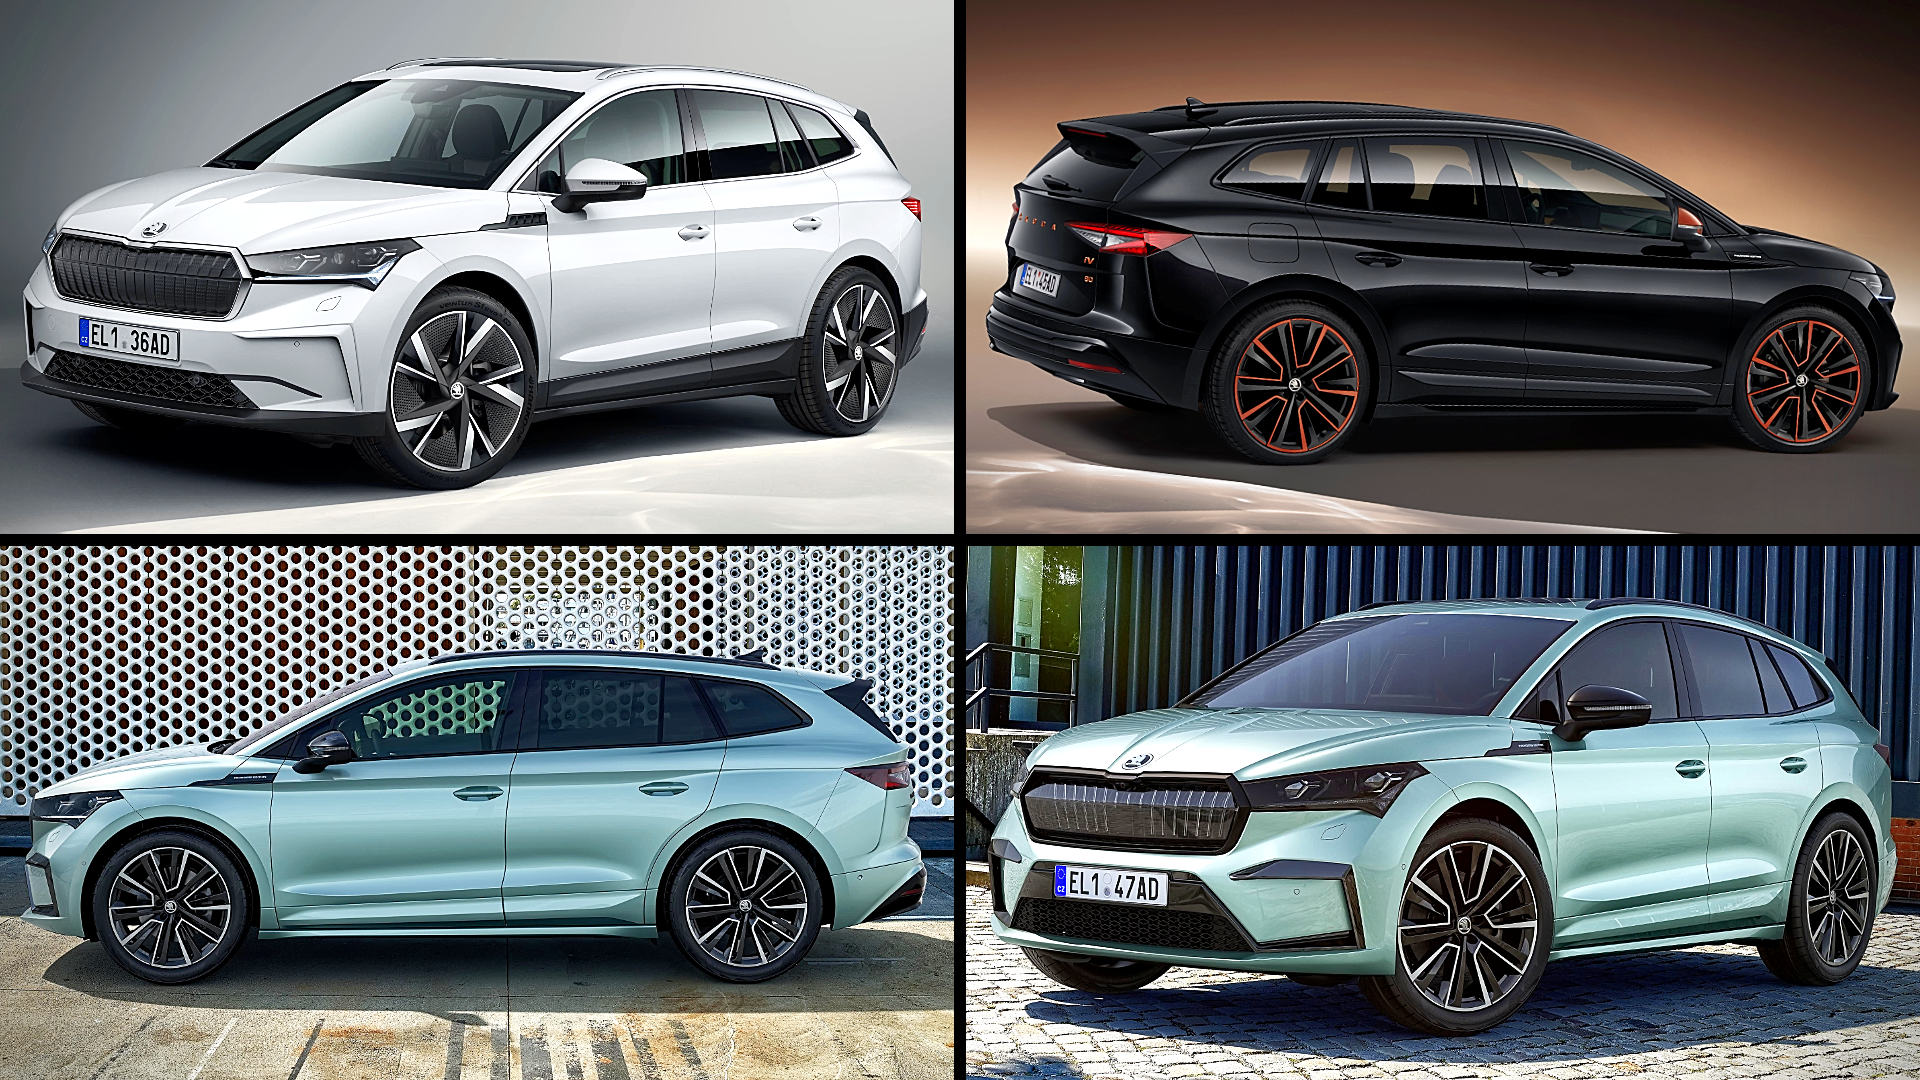 2021 Skoda Enyaq iV Crossover SUV Models Colors Photos